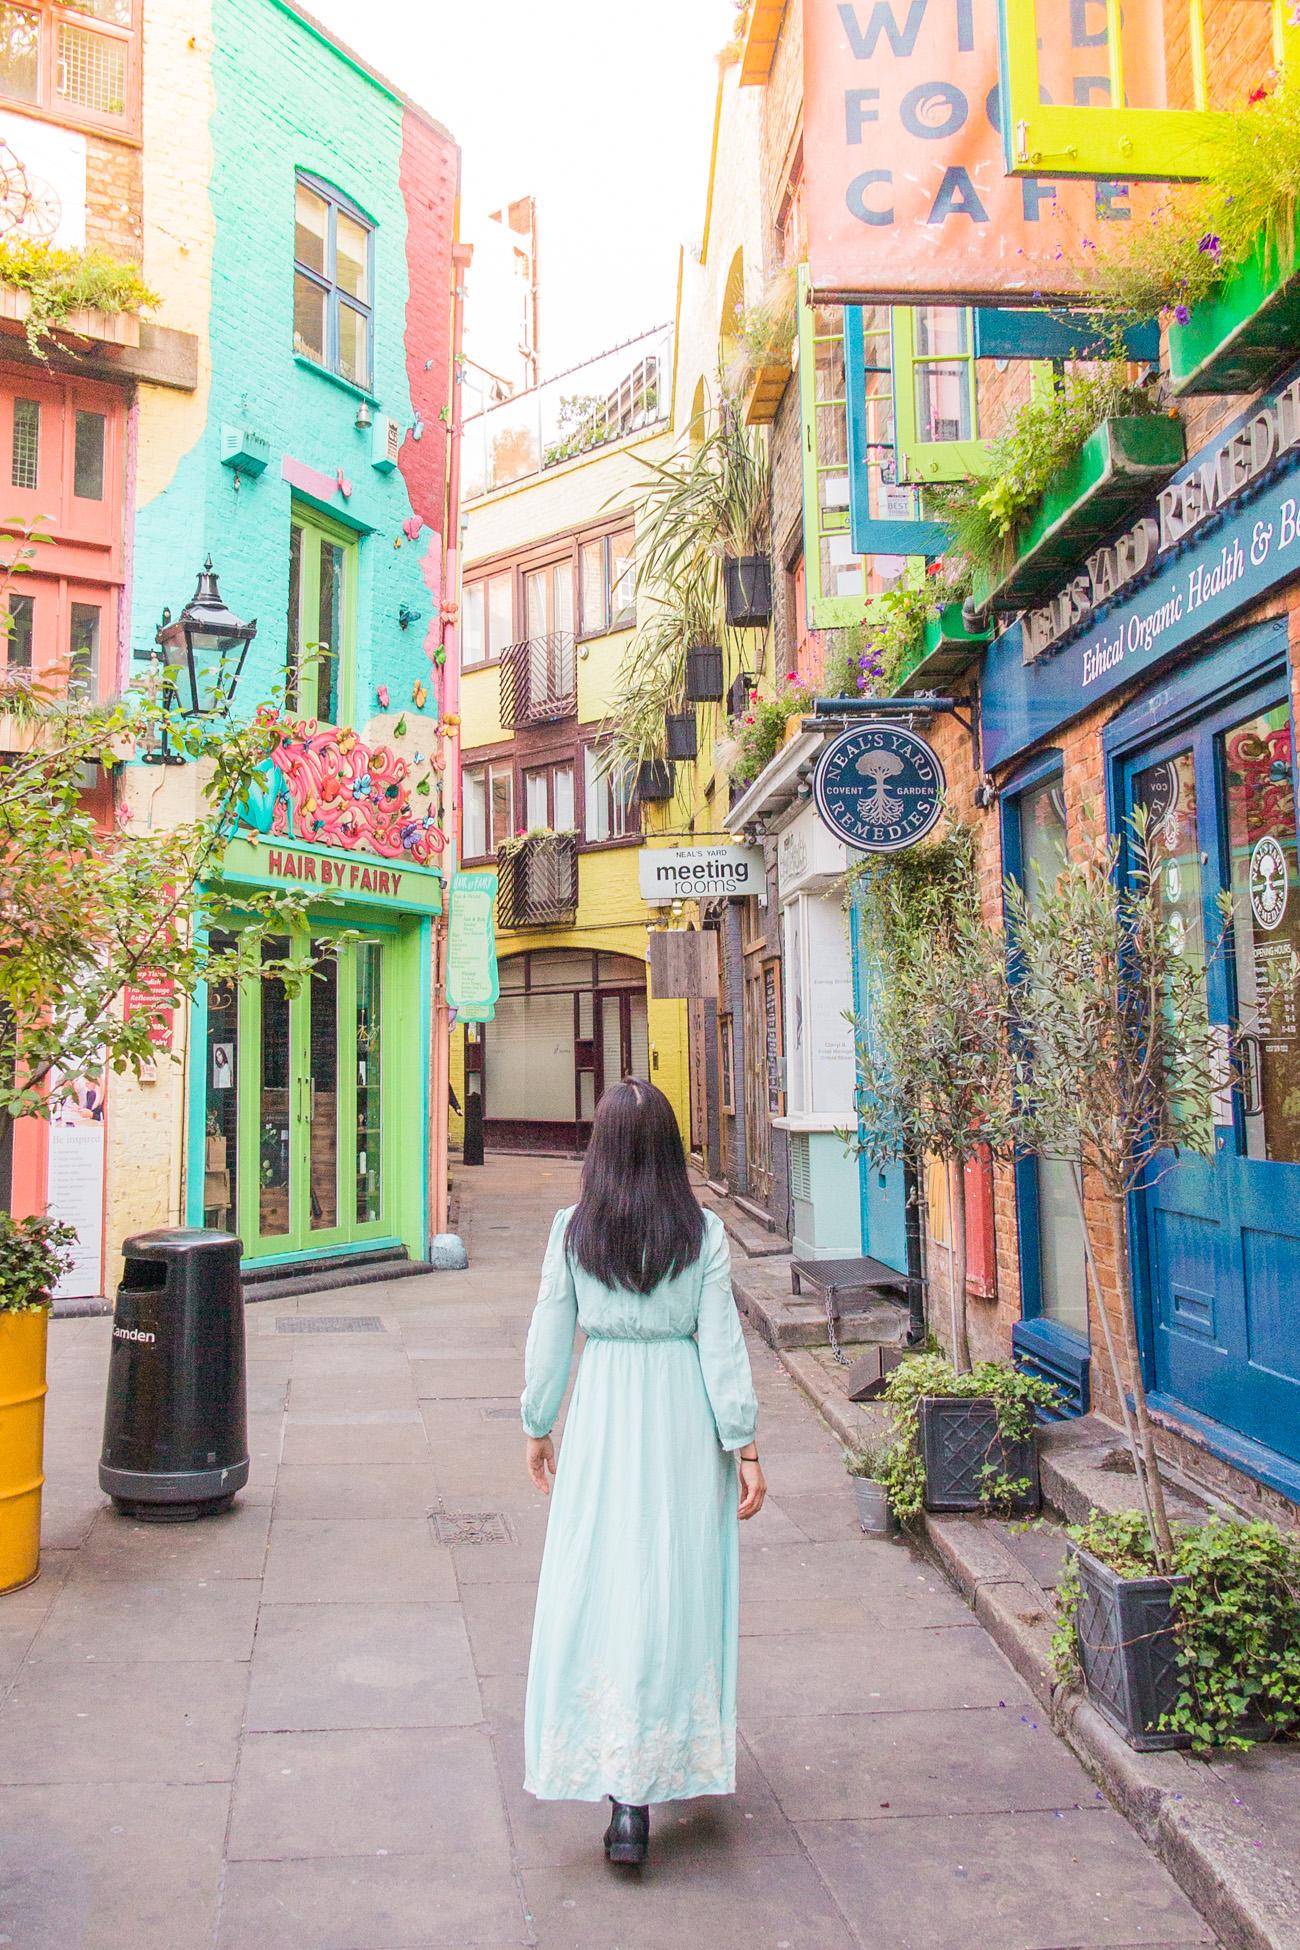 Chamelle Photography Travel and Life style blog blogger - London - United Kingdom